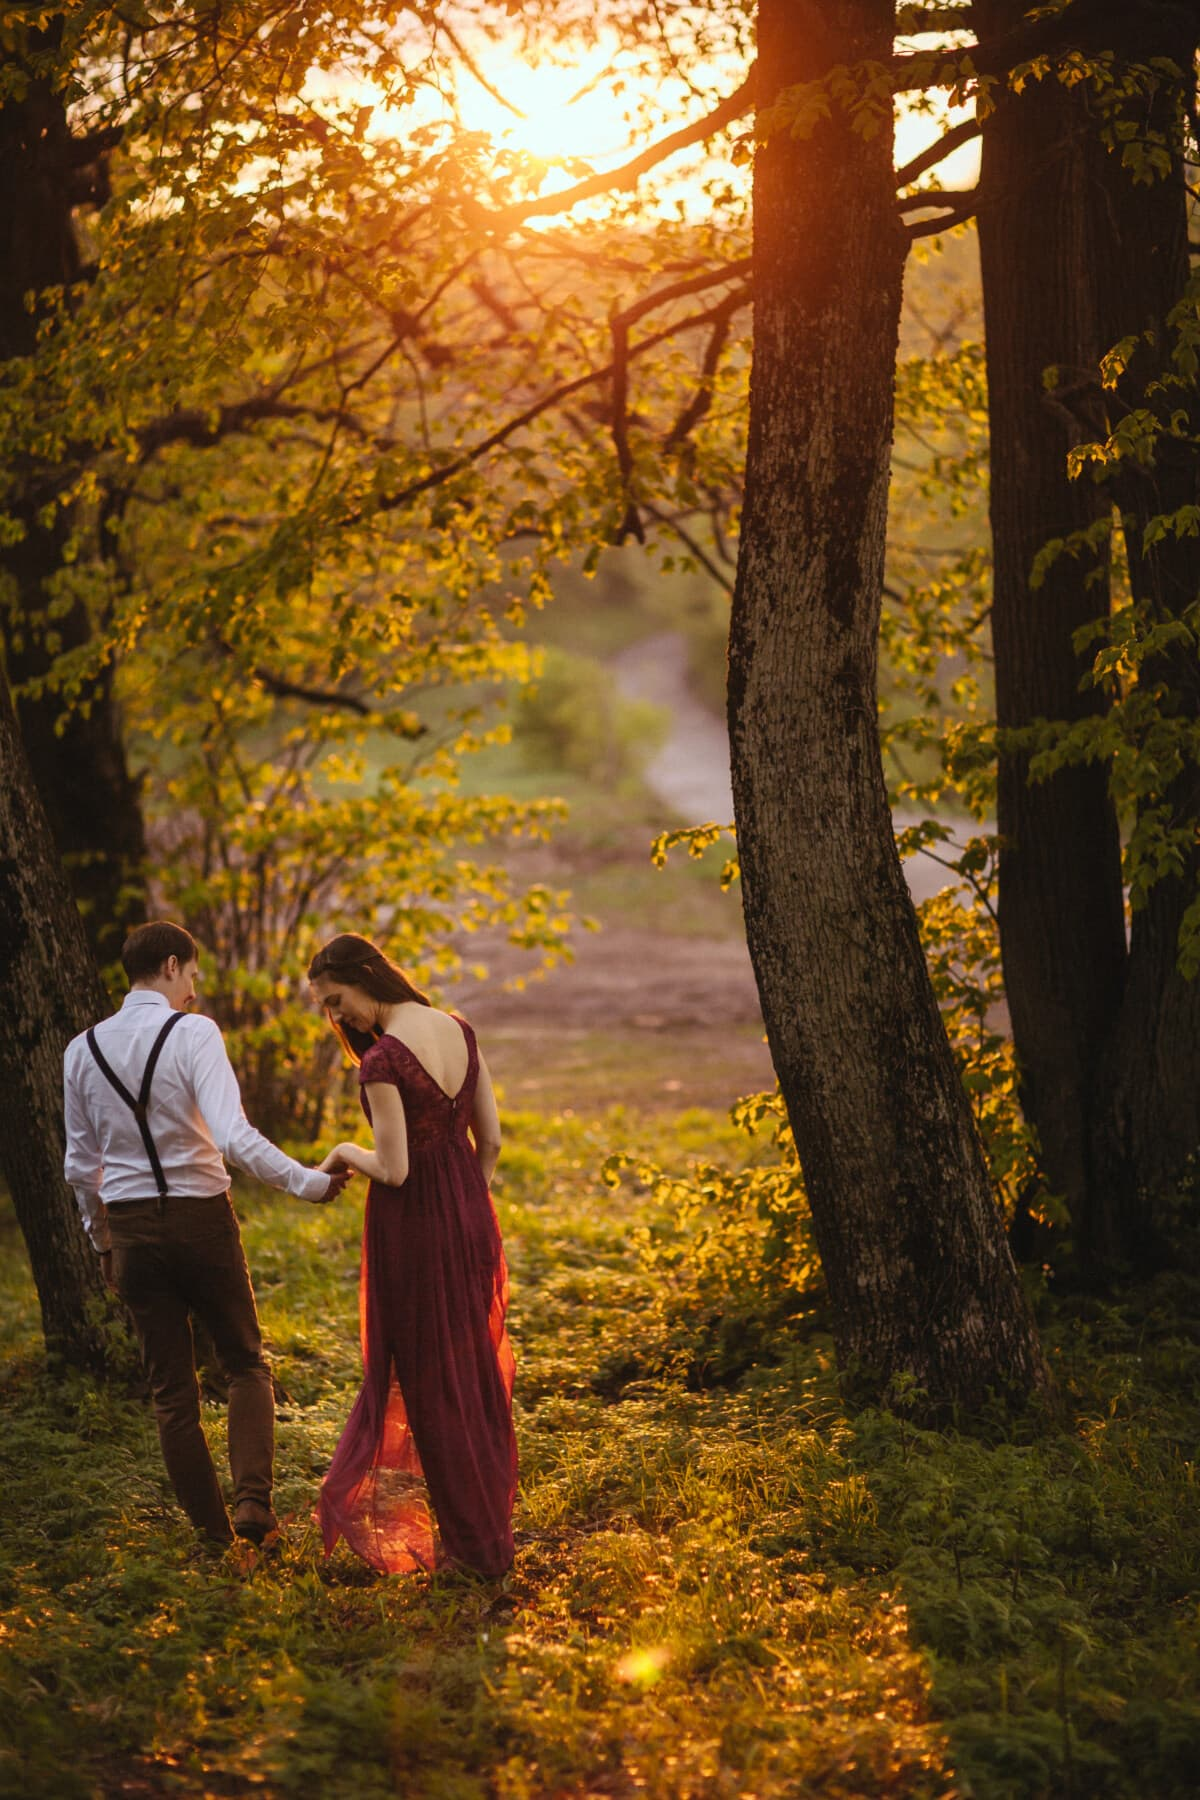 walking, romantic, boyfriend, girlfriend, forest trail, sunset, tree, park, trees, yellow